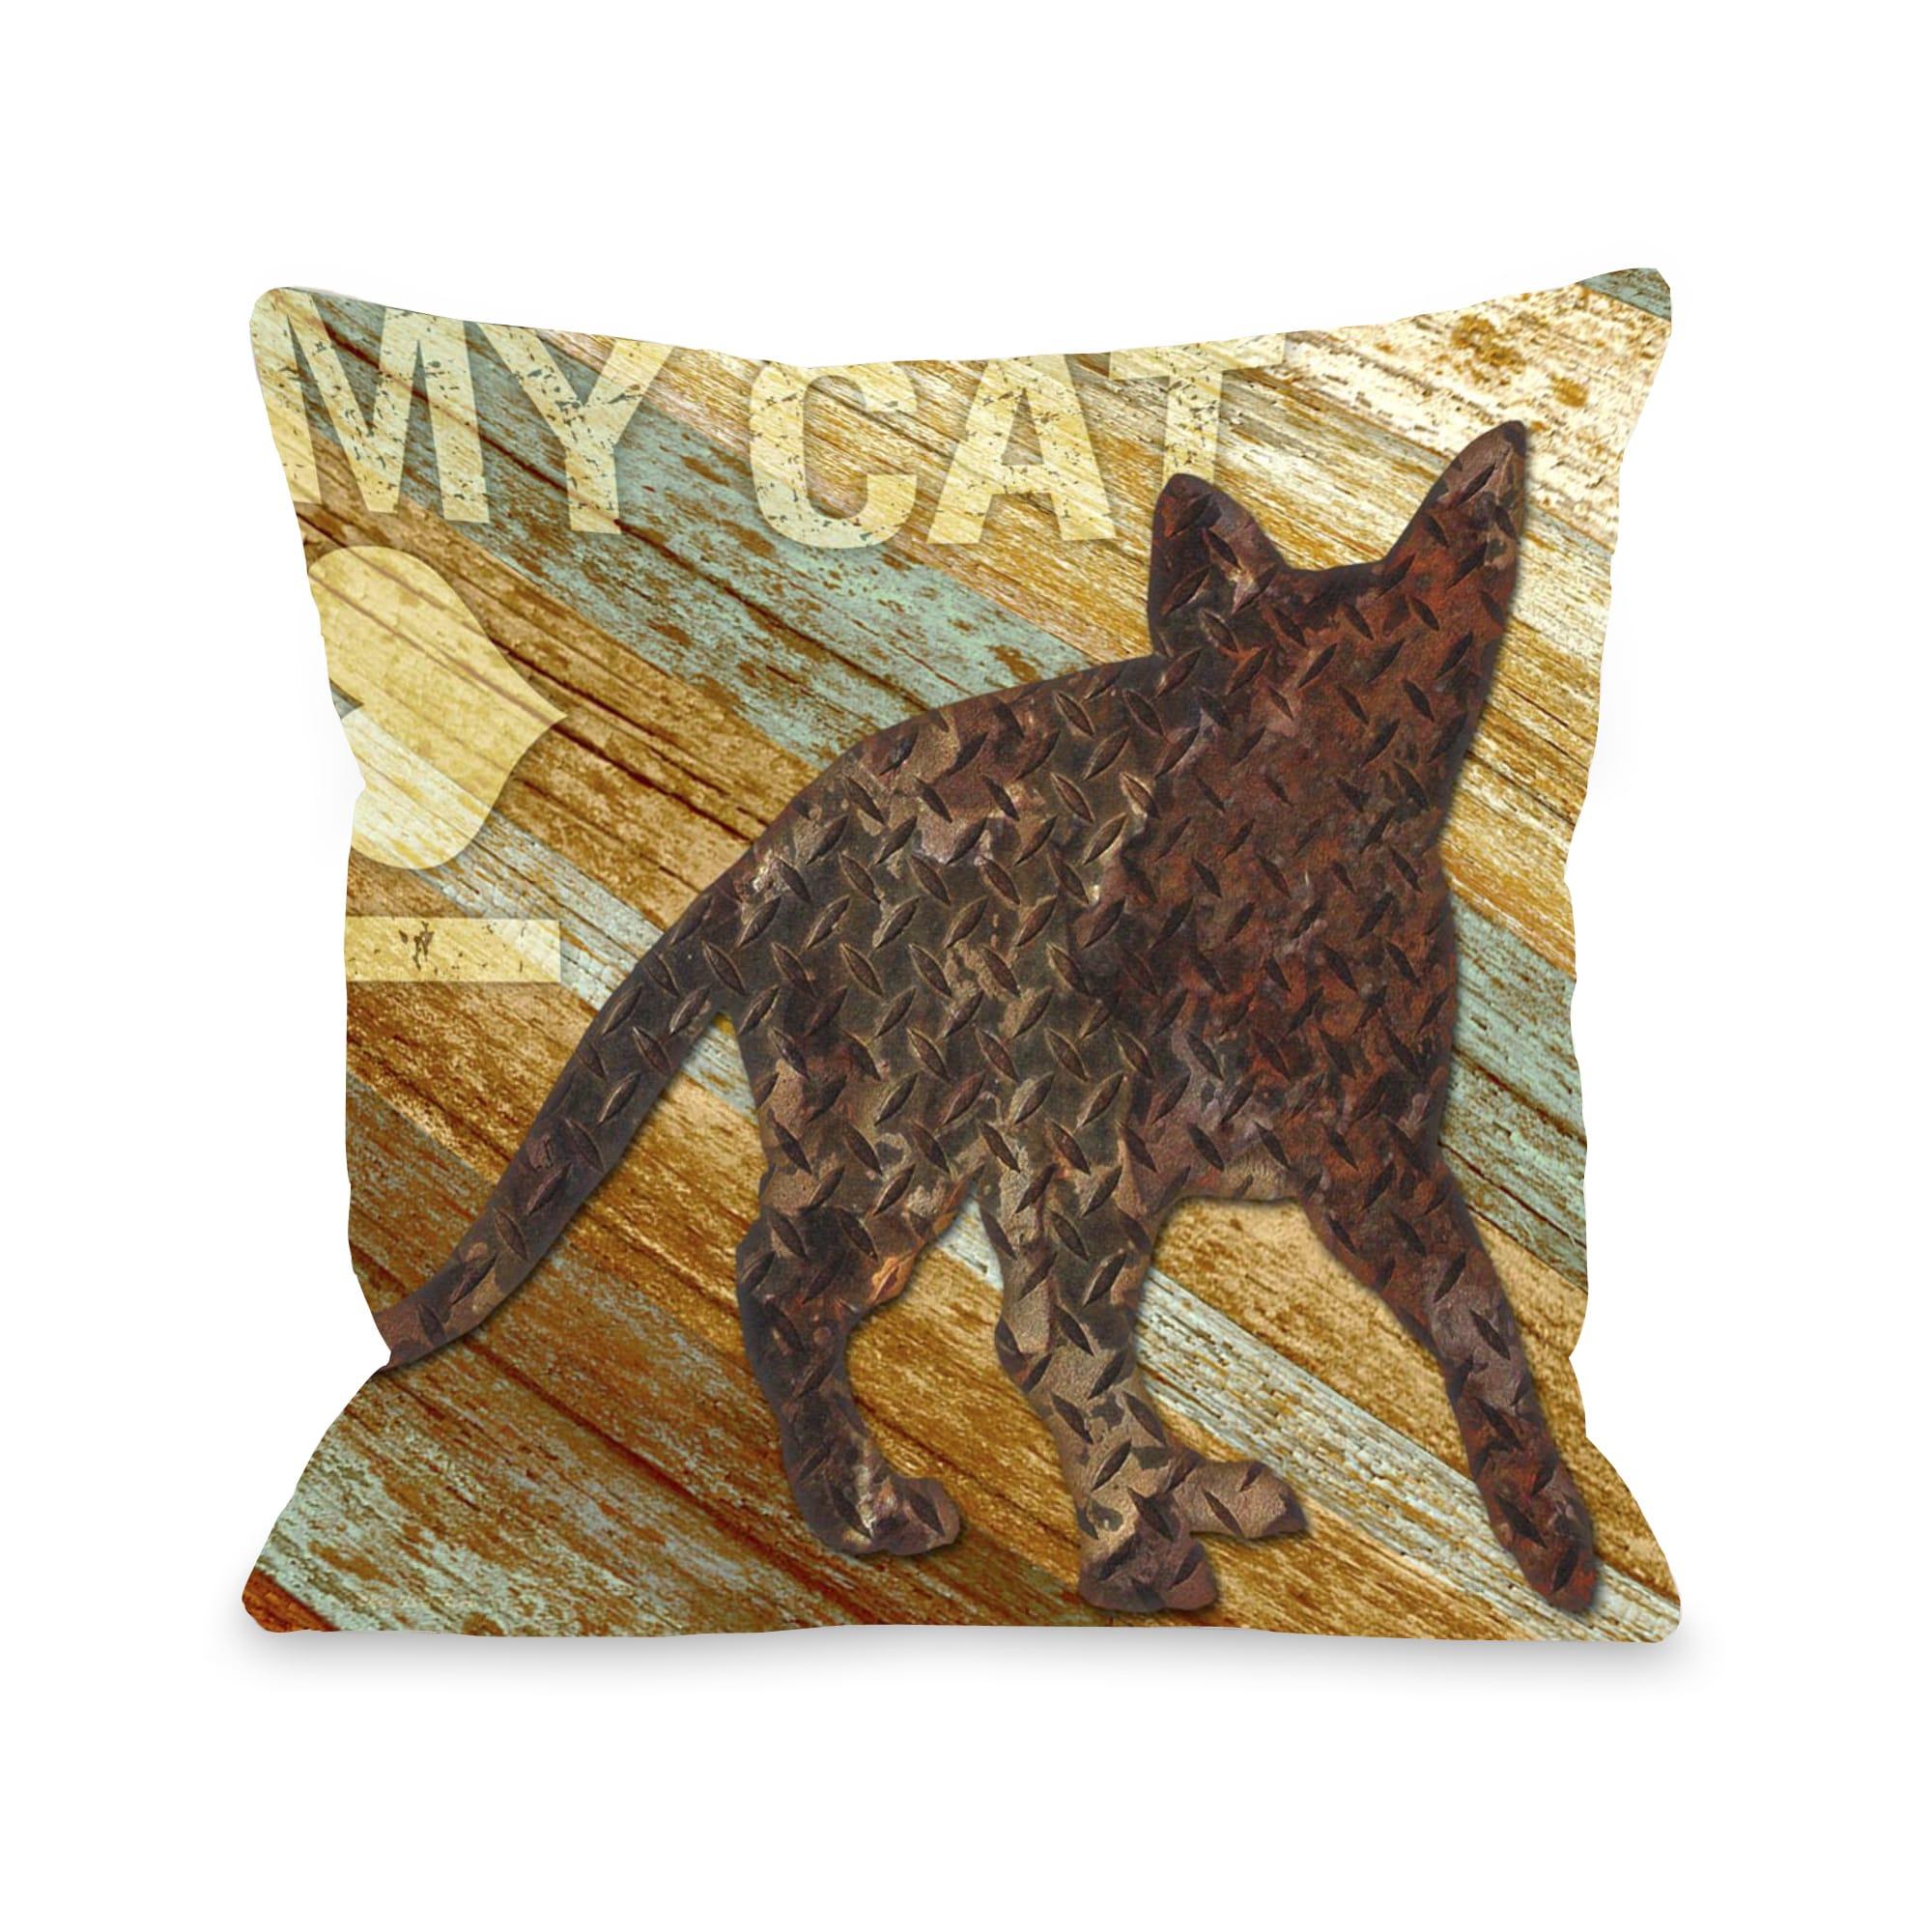 I love my Cat Wood Throw Pillow (Medium - 18 x 18)